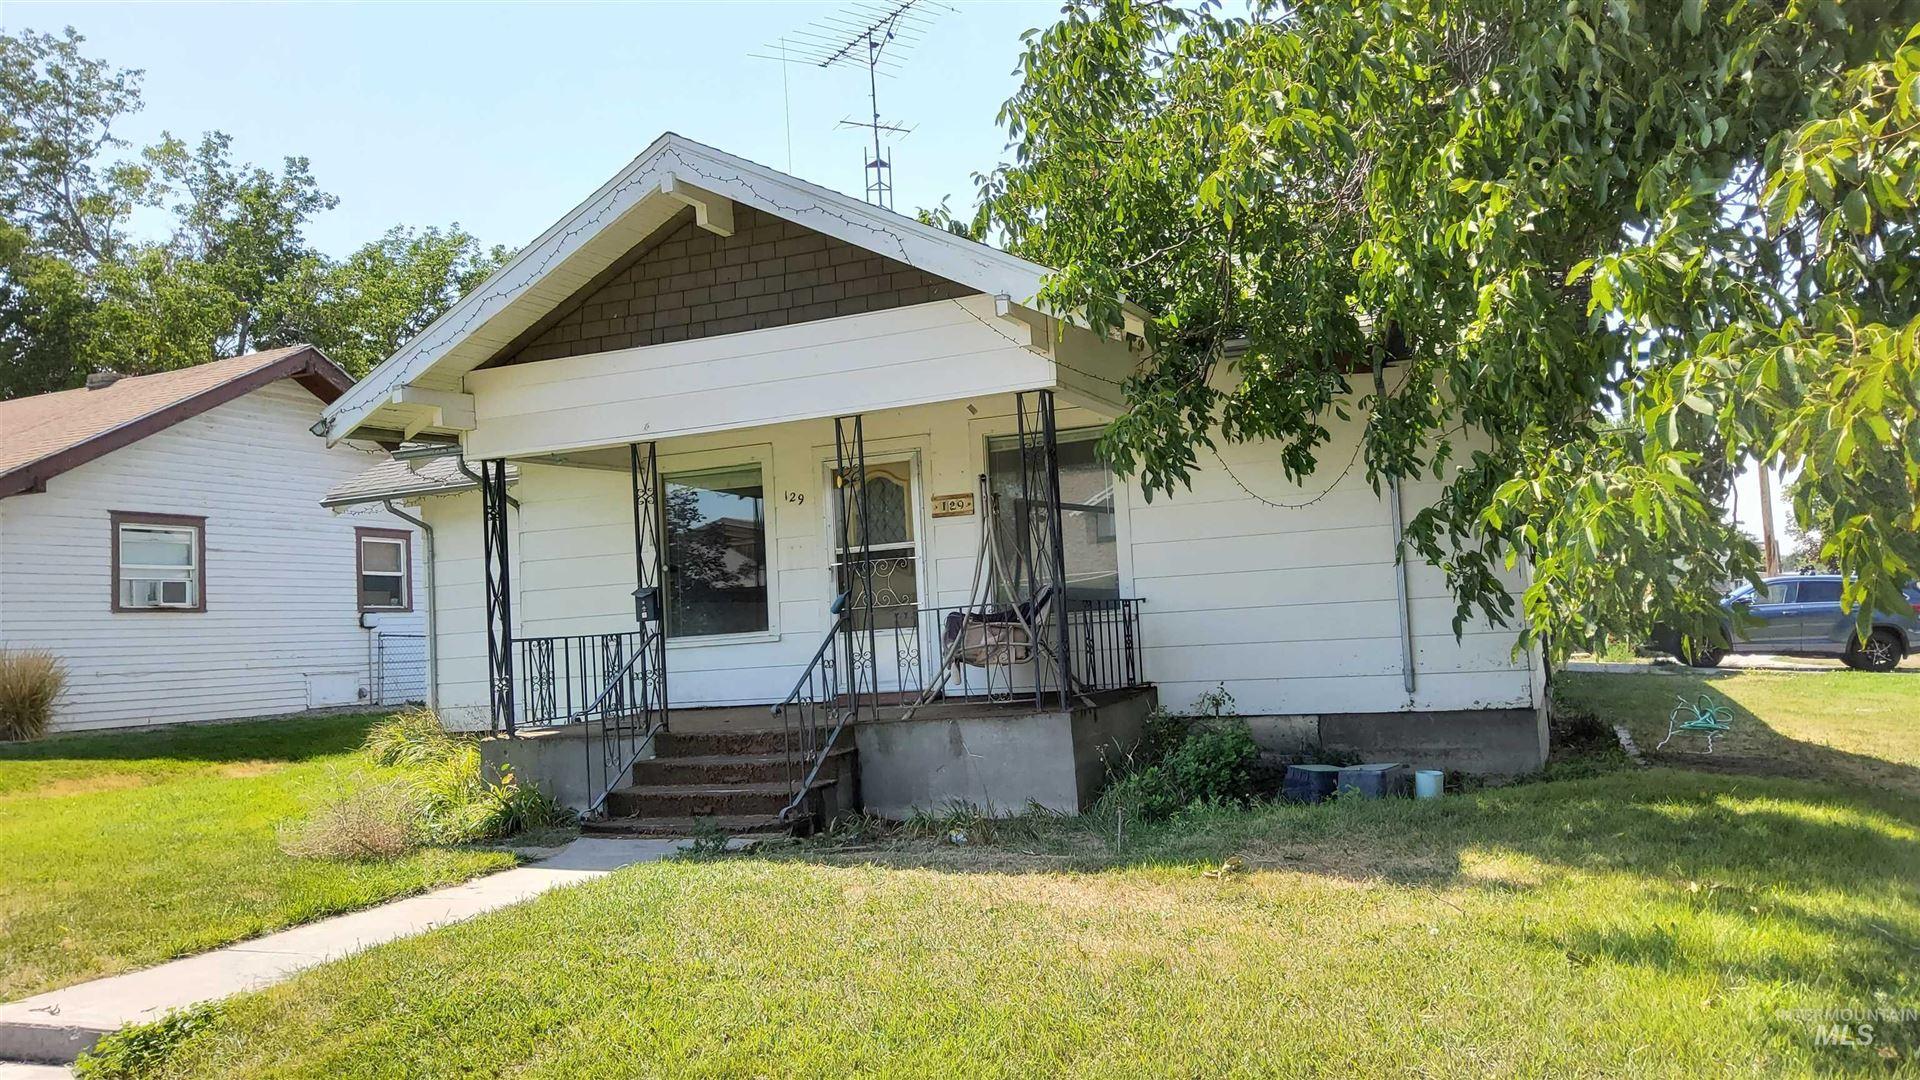 Photo of 129 12TH Ave. N., Buhl, ID 83338-6311 (MLS # 98806906)